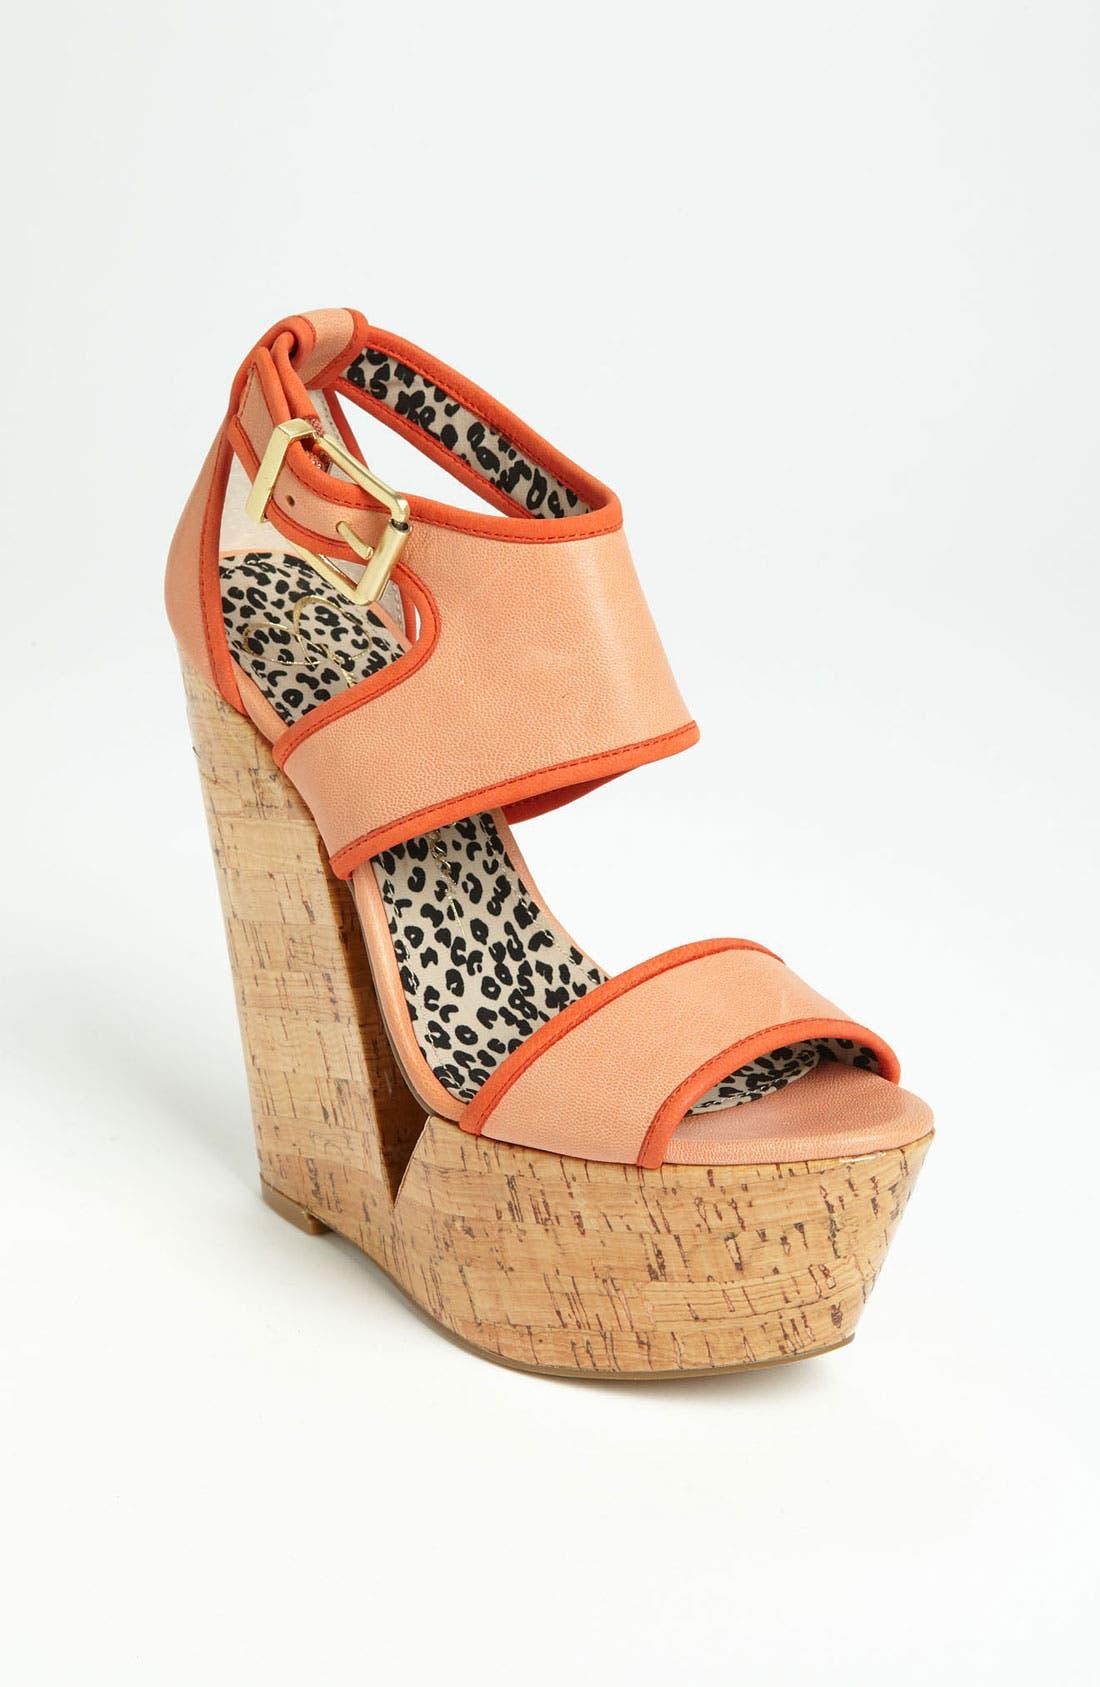 Alternate Image 1 Selected - Jessica Simpson 'Selin' Sandal